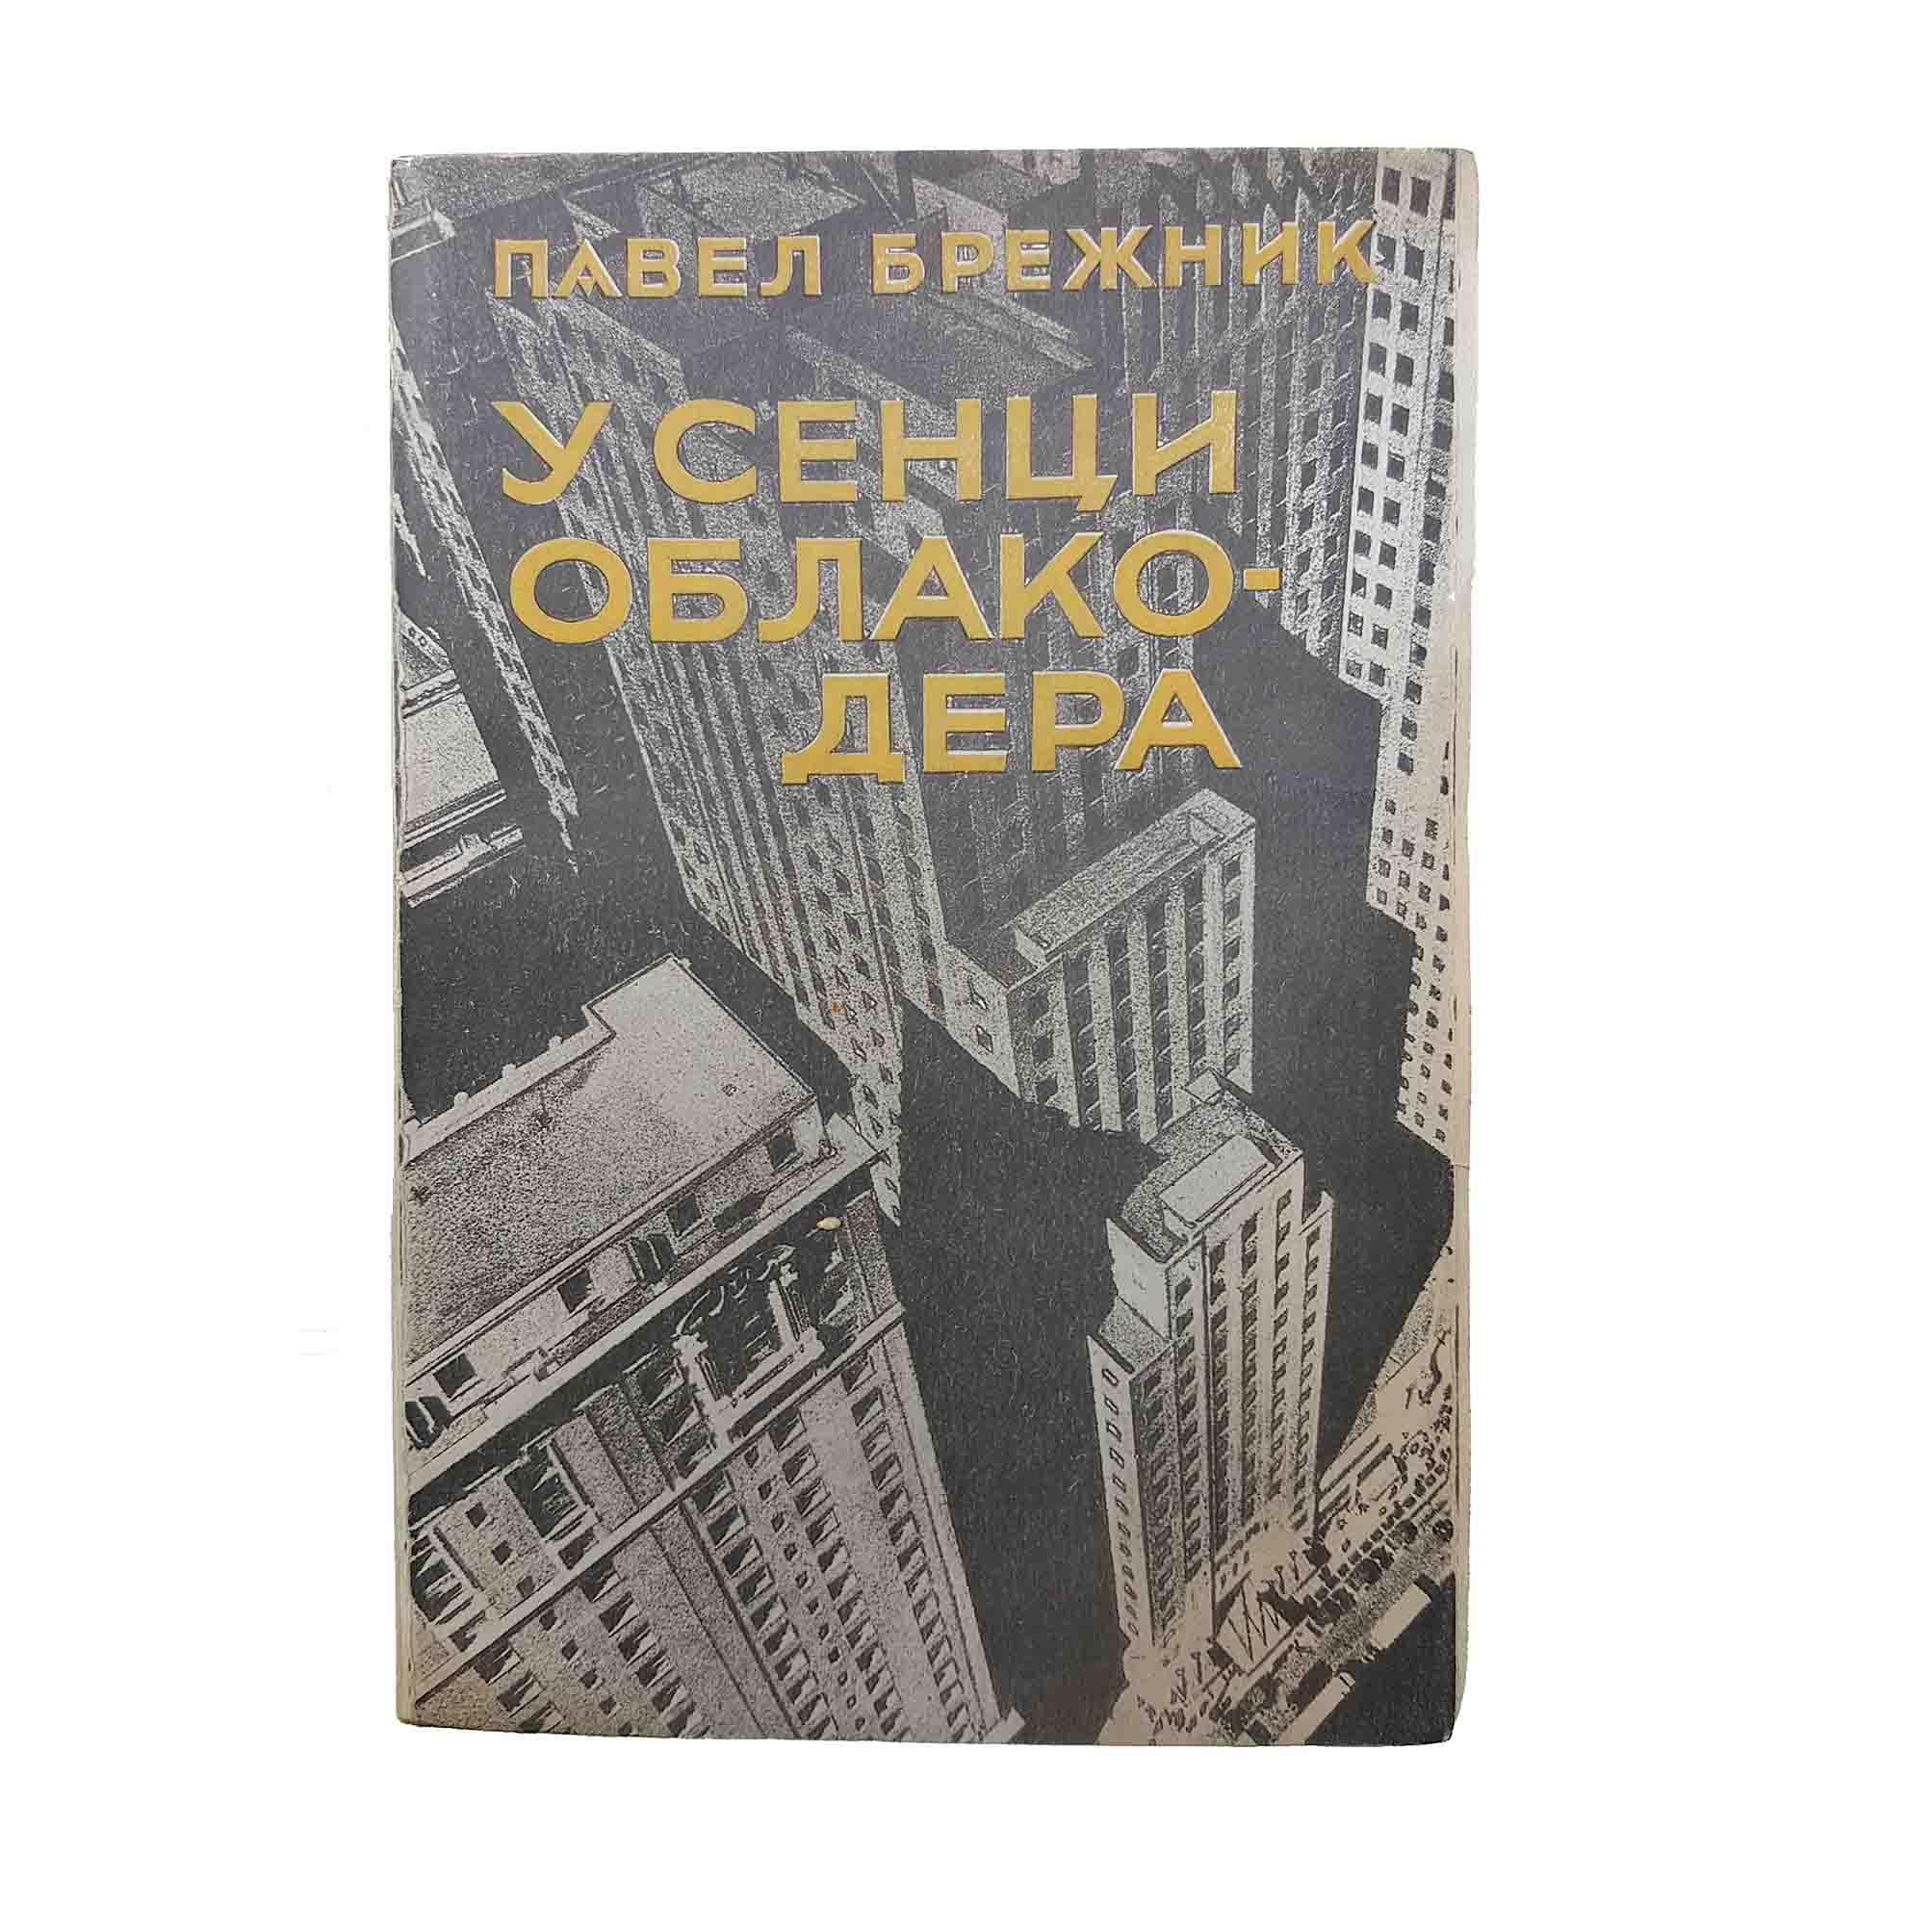 5822-Breznik-Senci-Oblakodera-1933-Umschlag-recto-frei-N.jpg